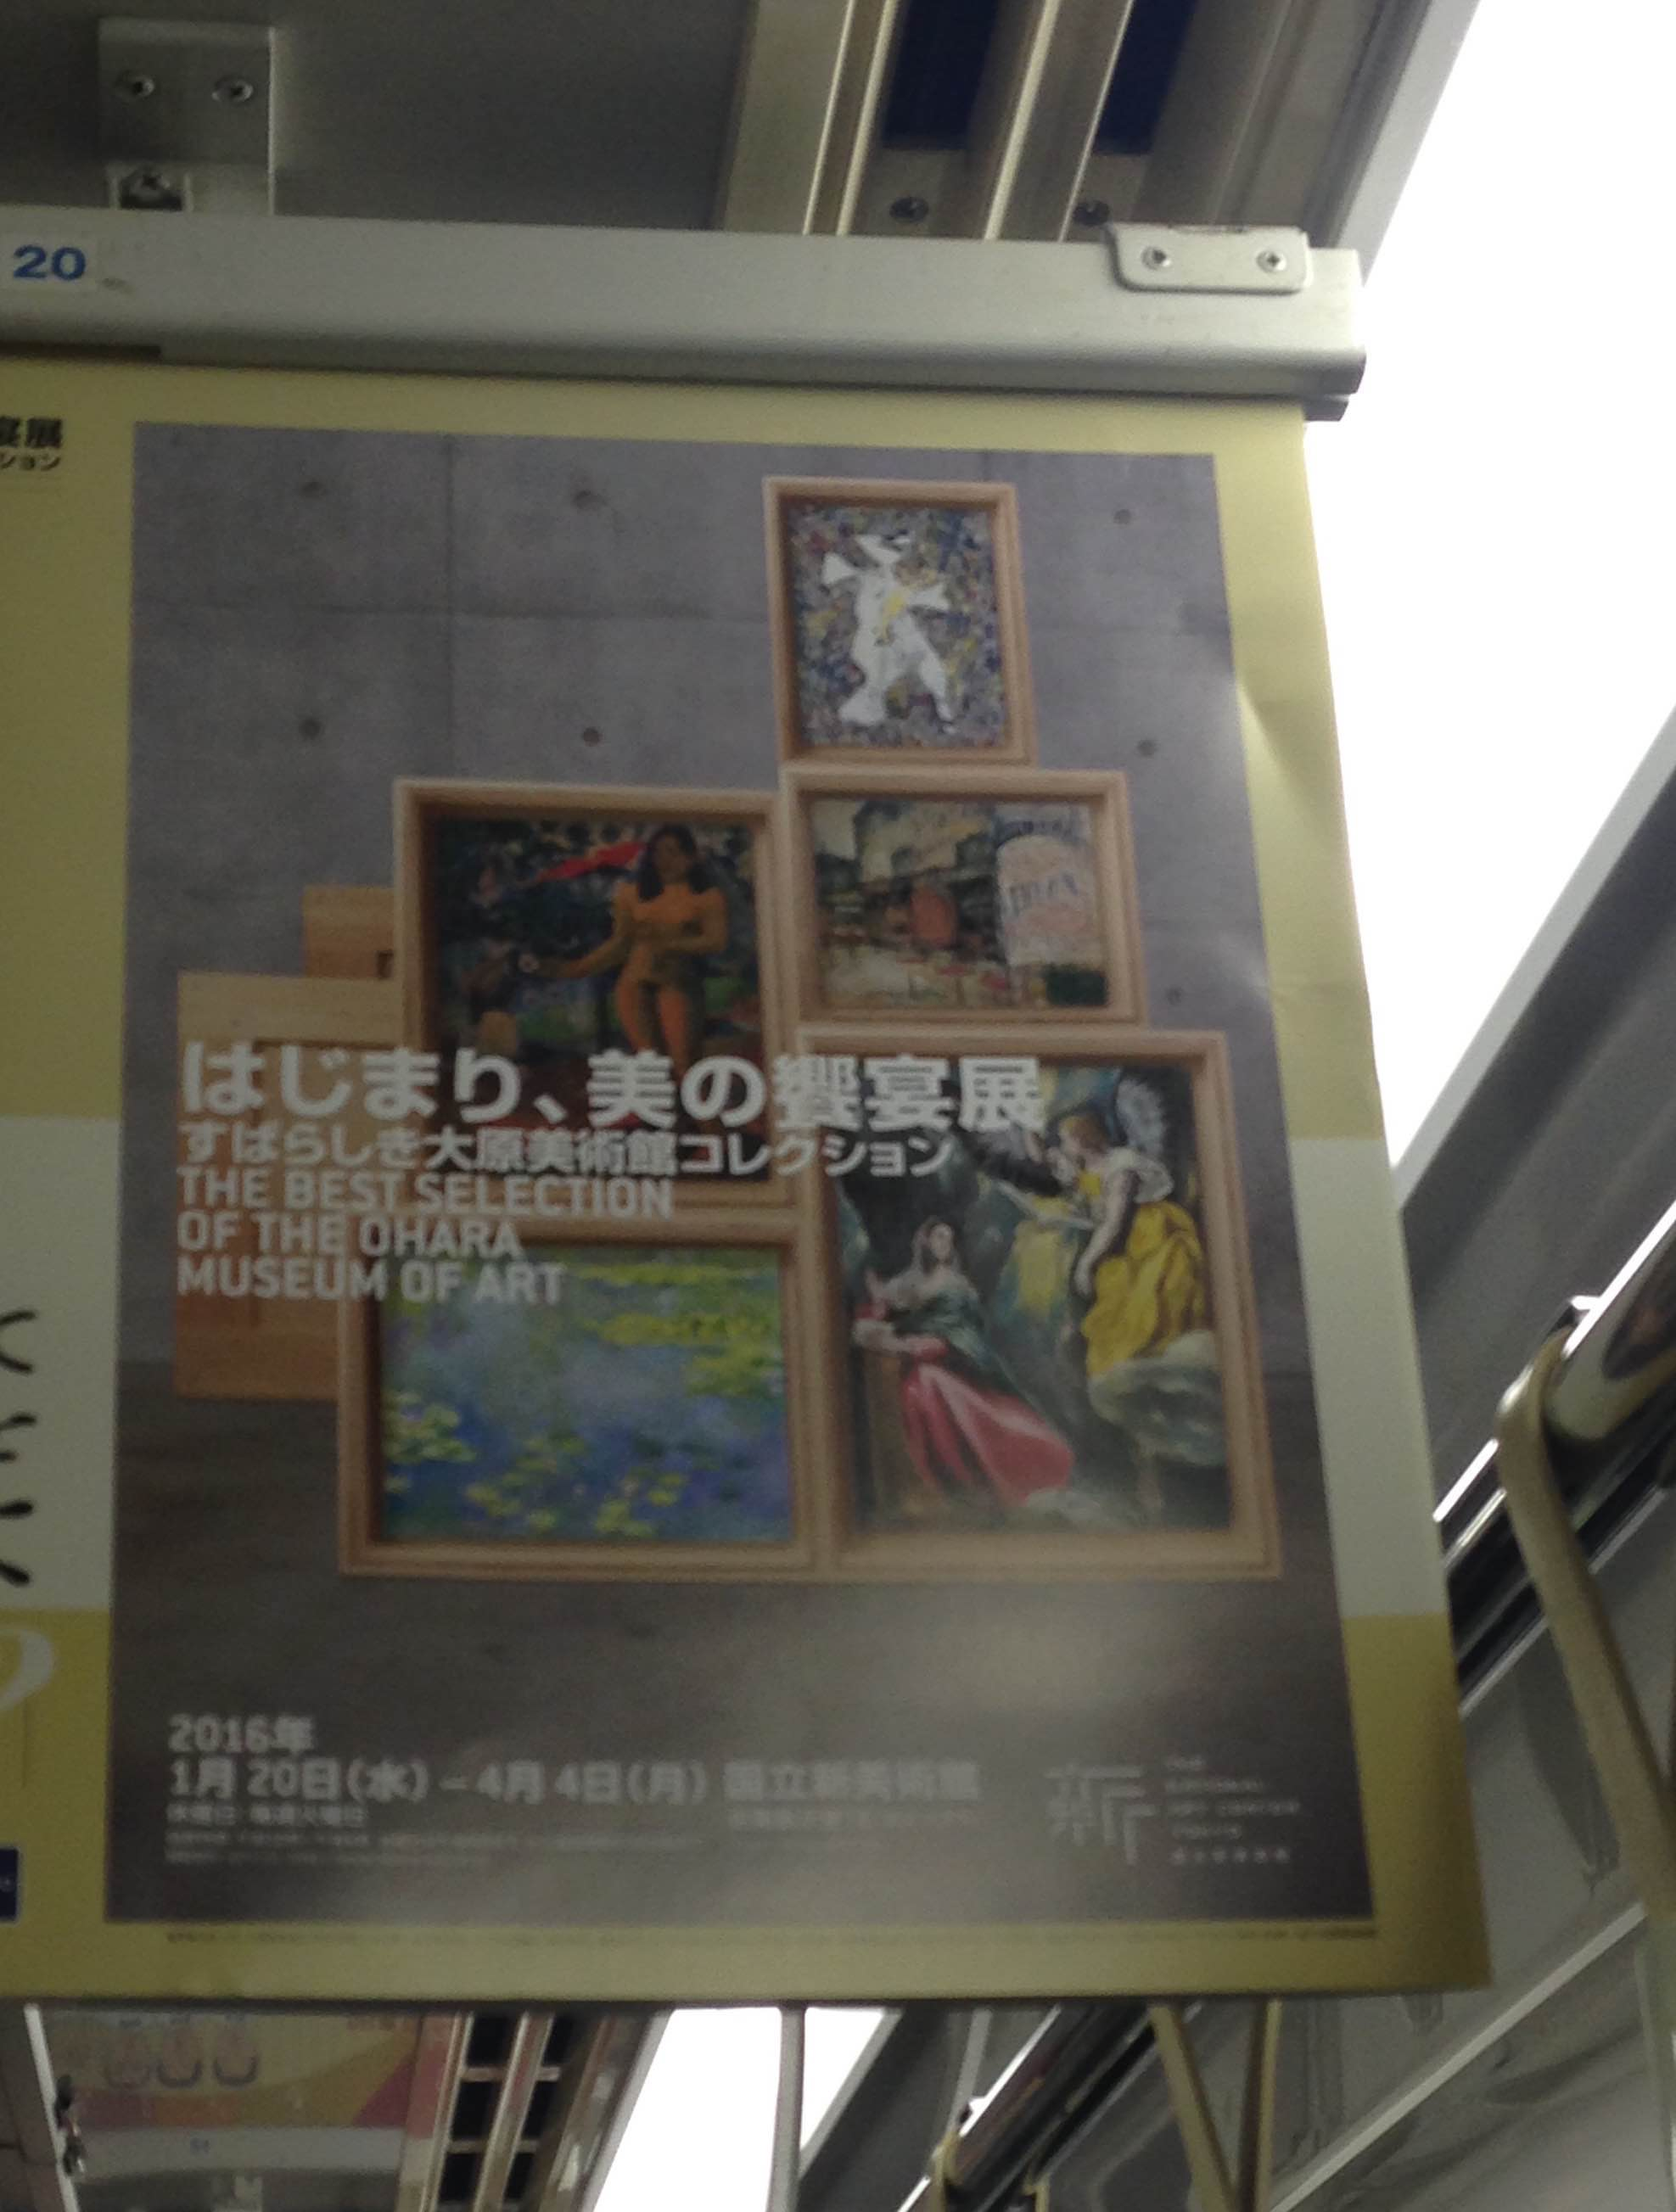 大原美術館 美術展 ポスター